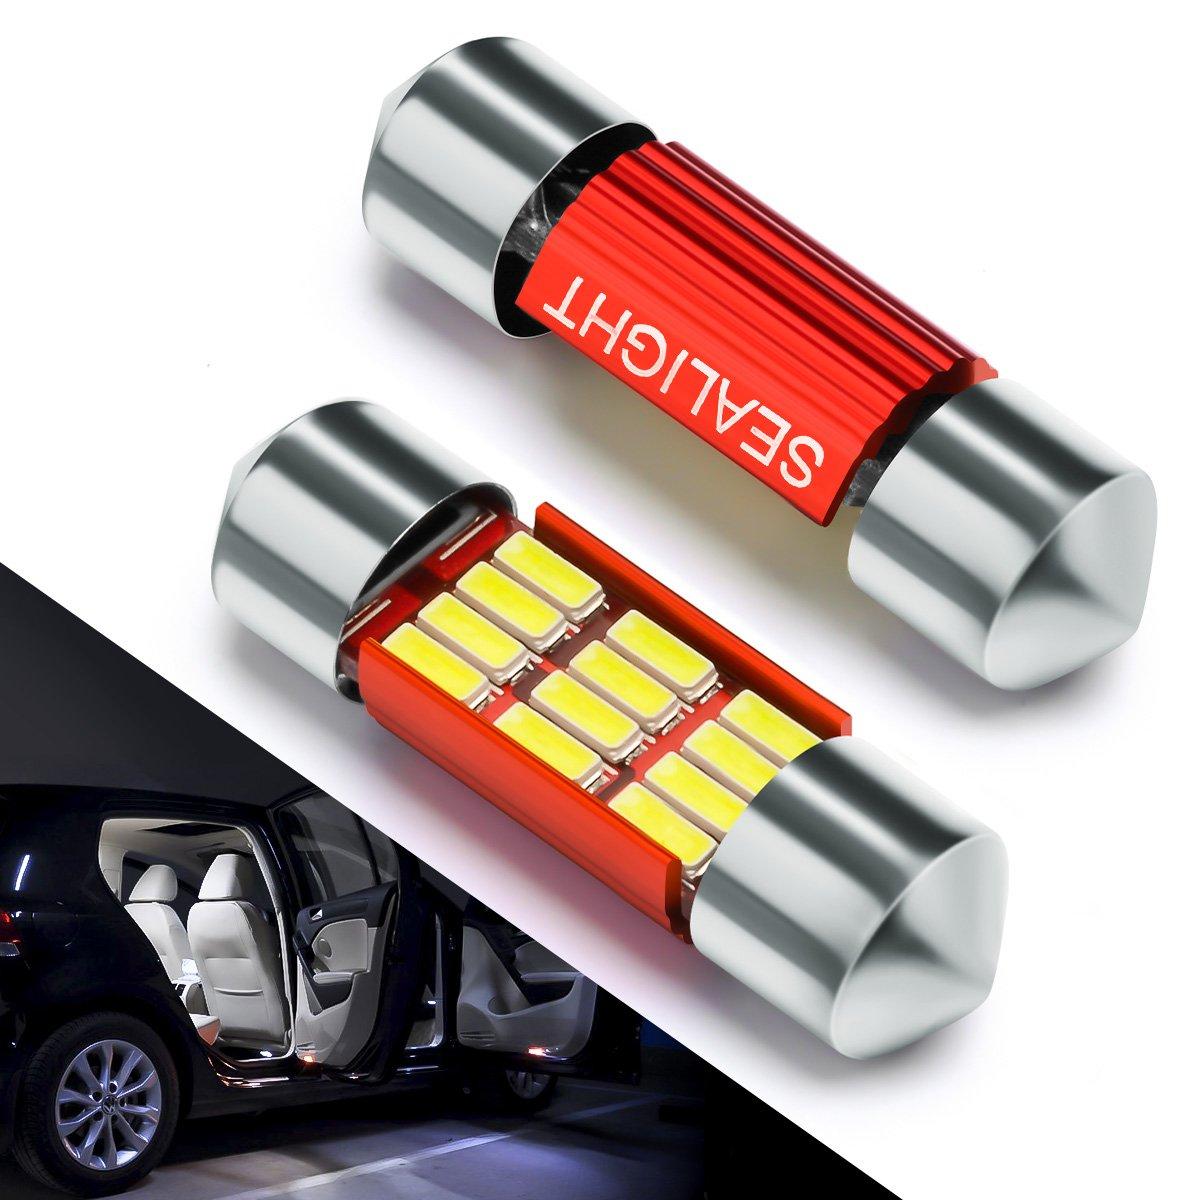 DE3175 led interior lights dome light bulb for car 3175 led bulb- SEALIGHT 4014 Chipset Canbus Error Free DE3021 DE3022 31mm 1.25 inches bulbs 6000K Xenon (S2) 4333000996